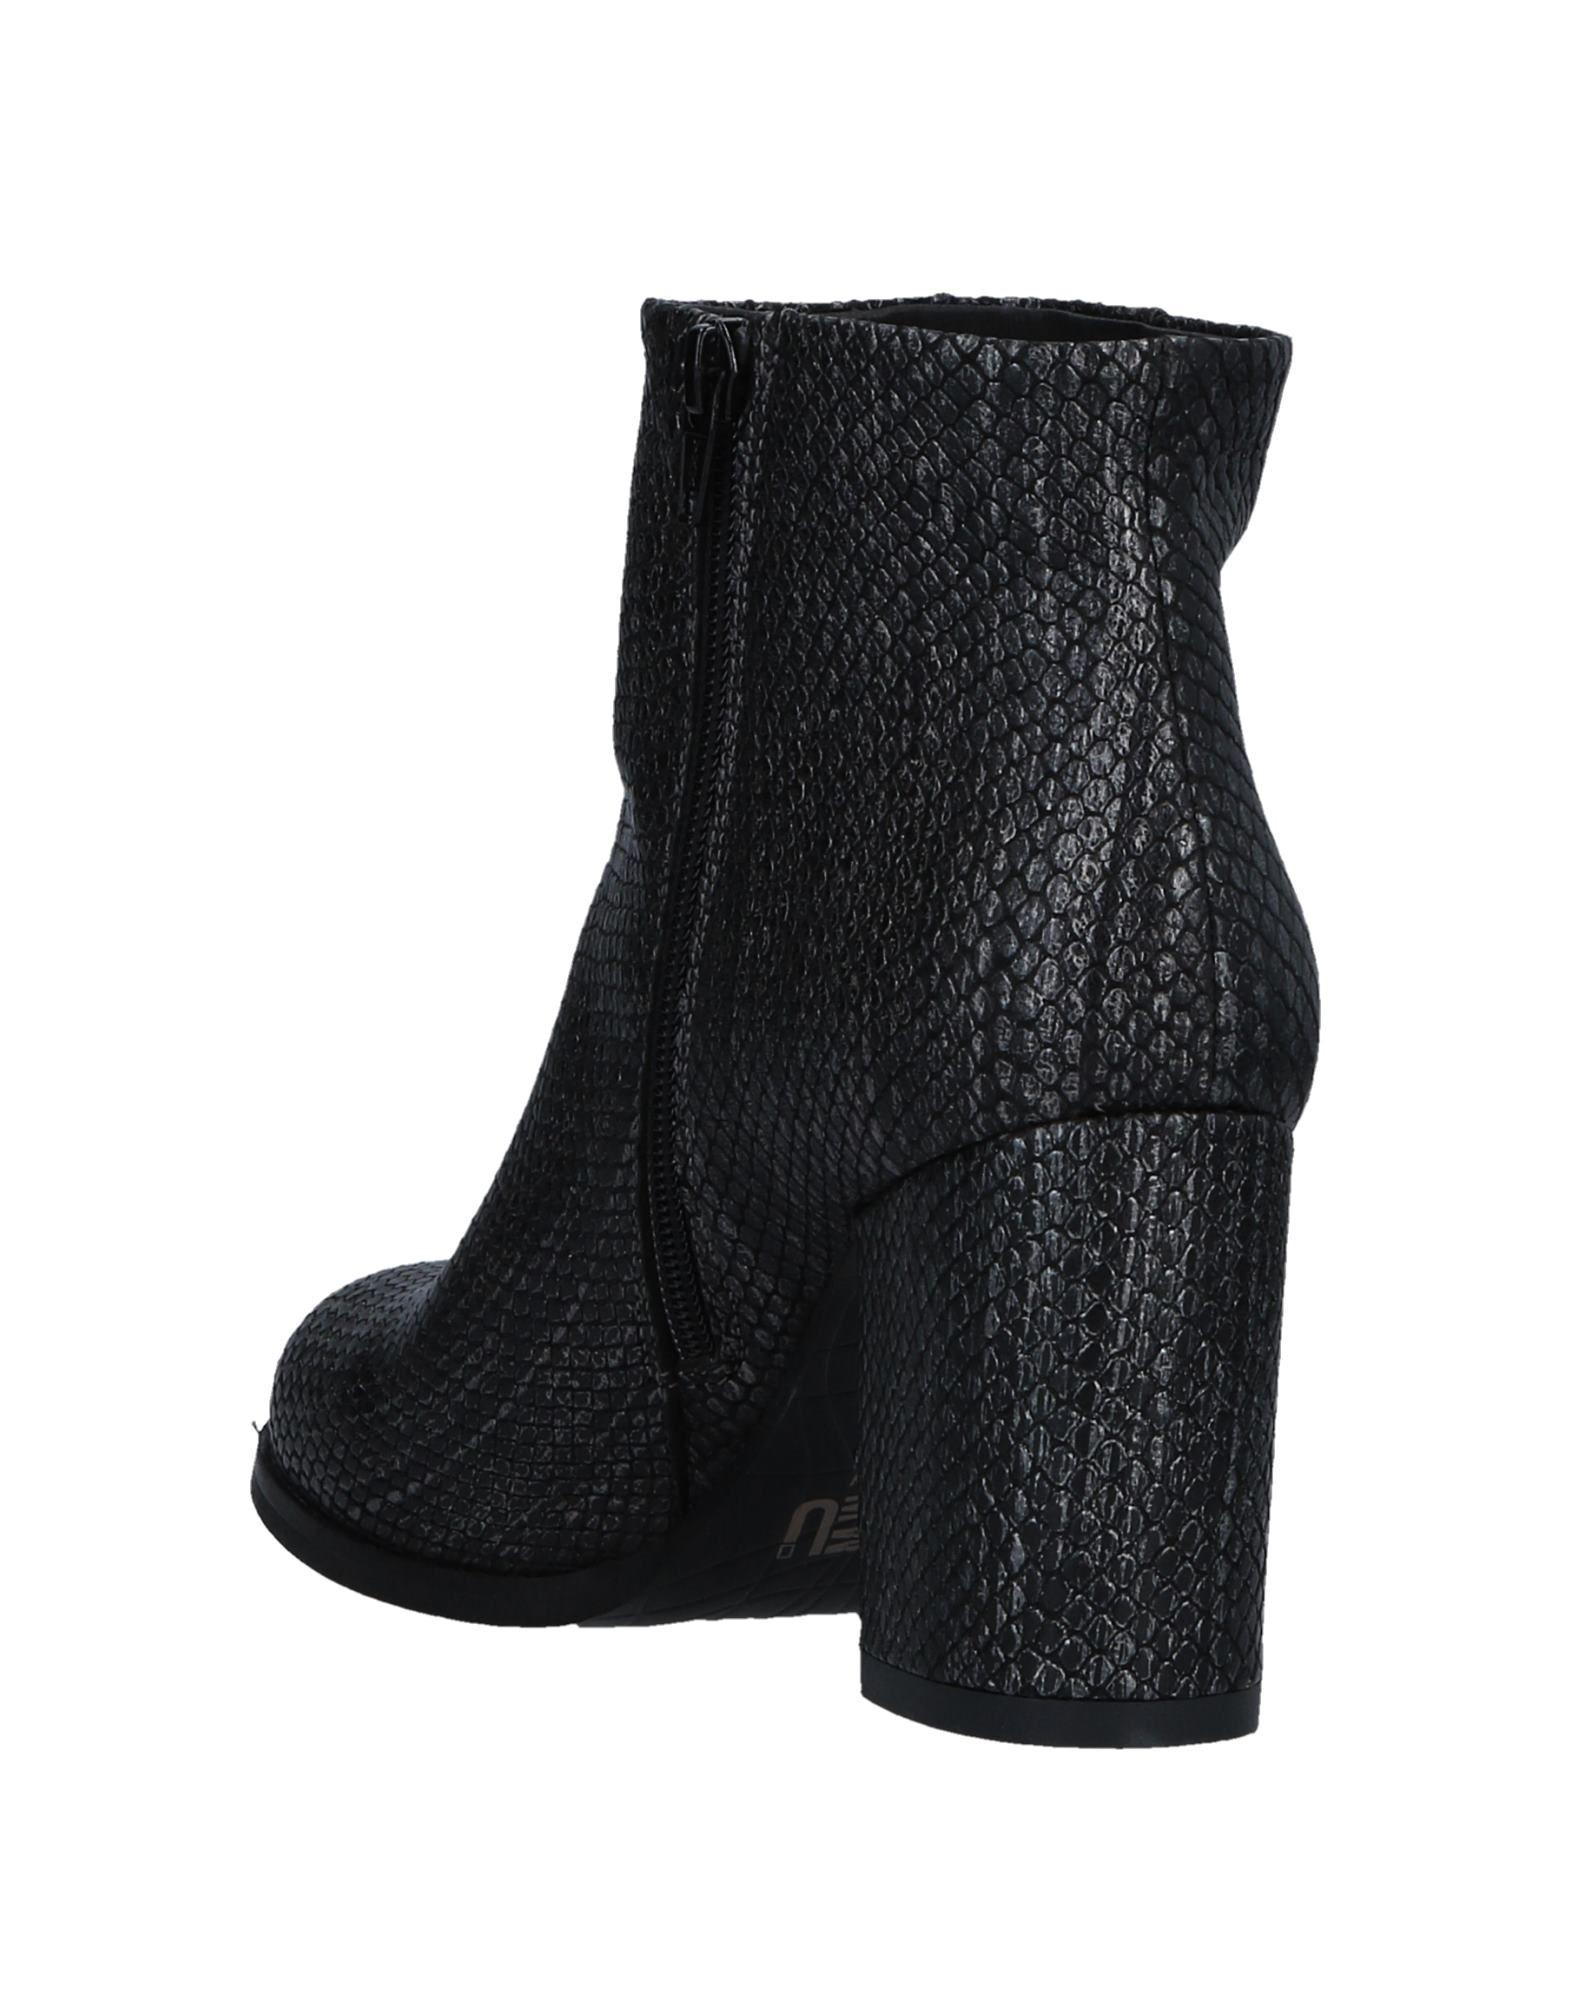 Mimmu Stiefelette Damen  Schuhe 11522730RH Gute Qualität beliebte Schuhe  e54887